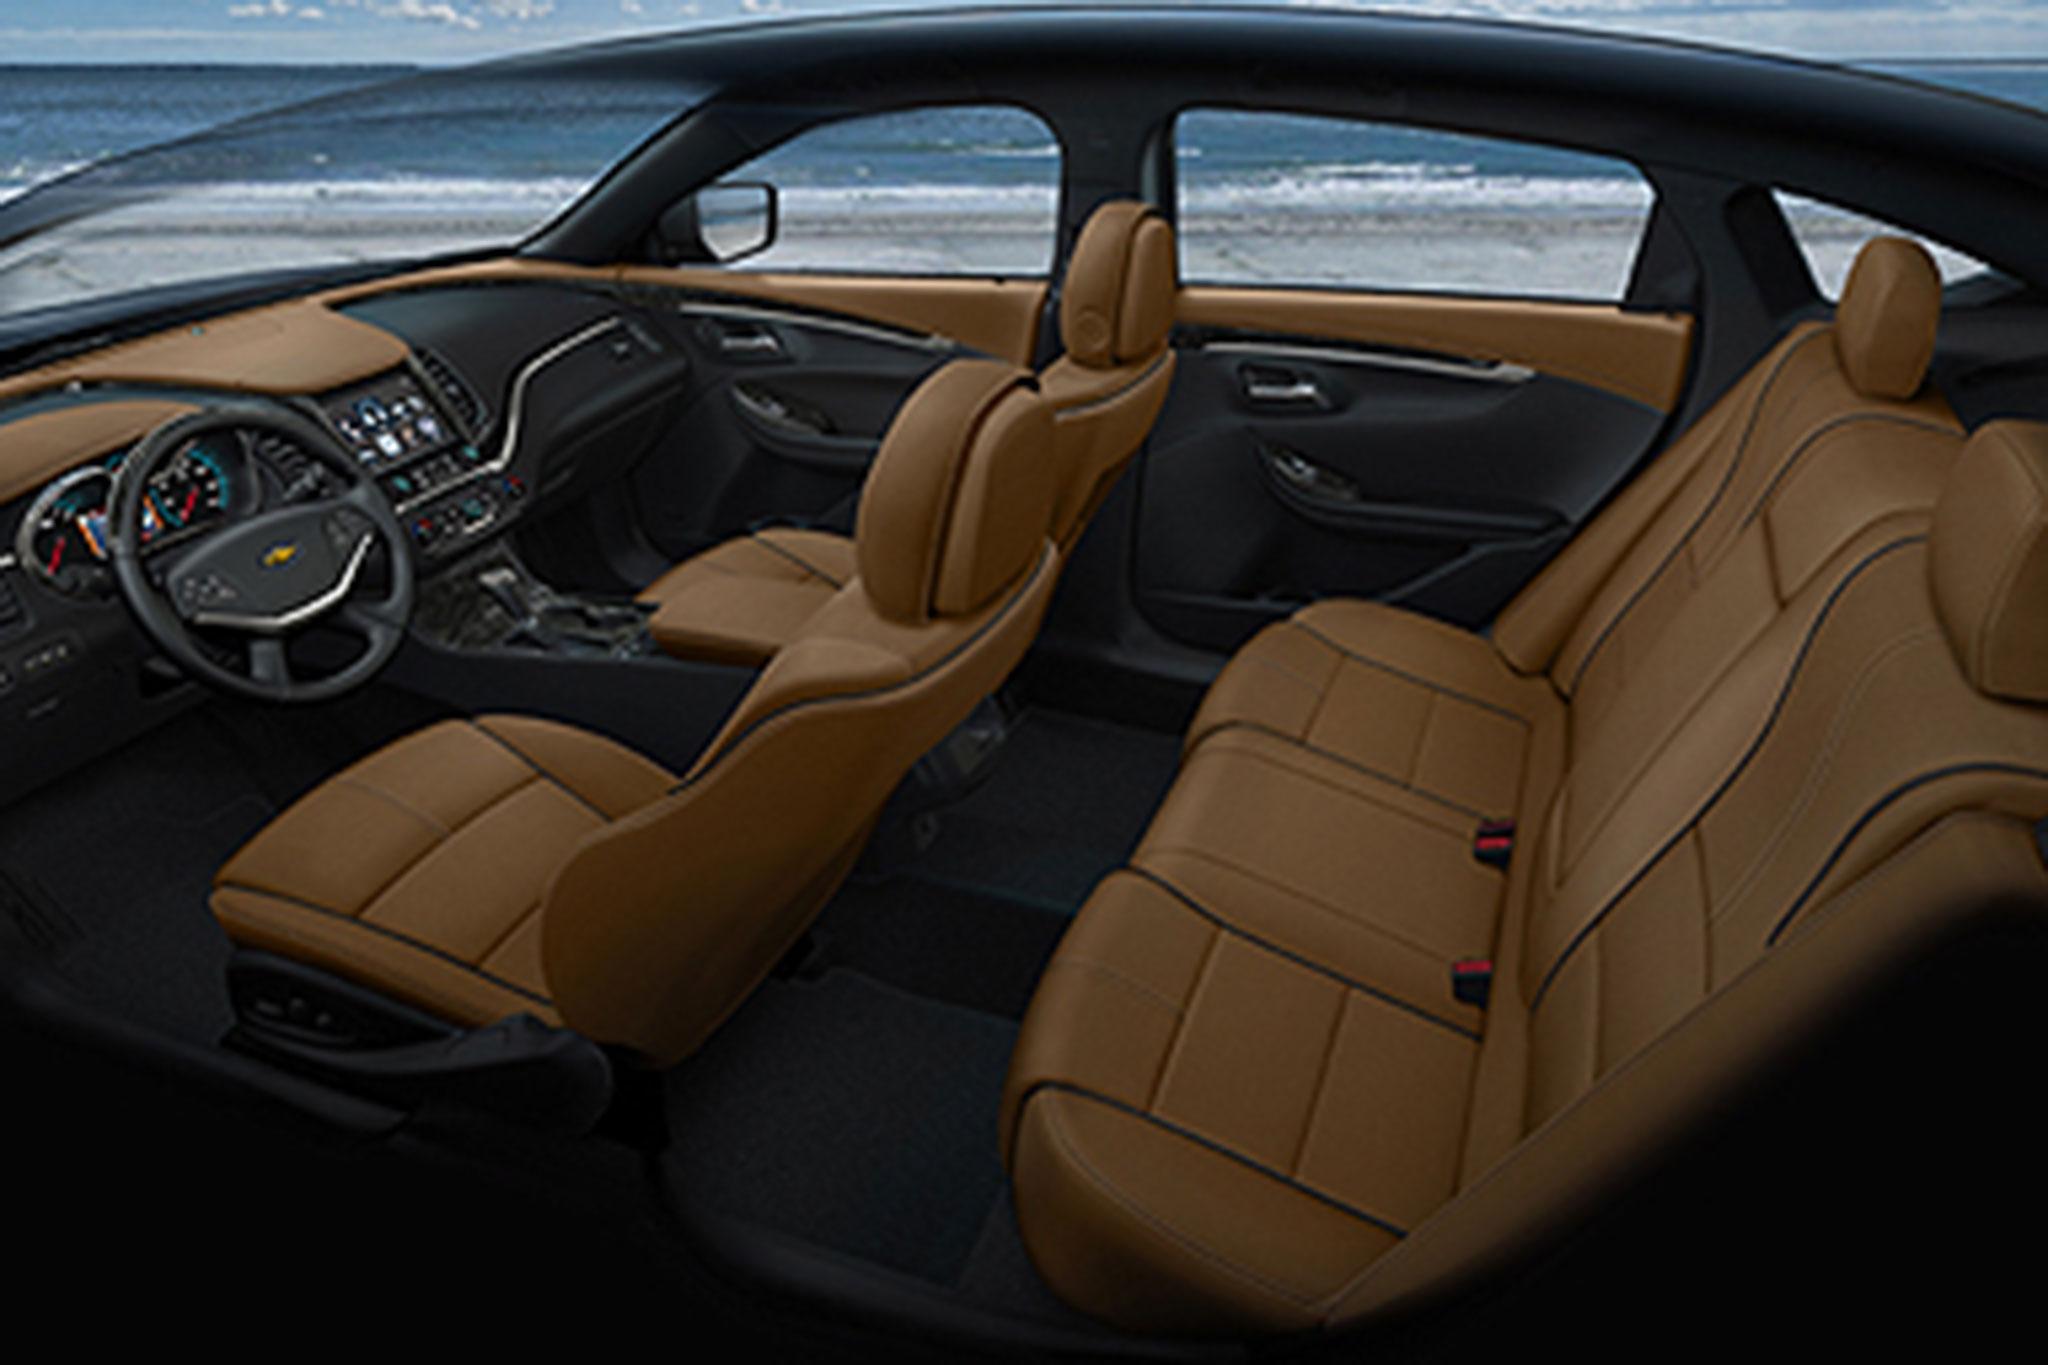 2014 Chevrolet Impala Great Lakes Circle Tour Lake Huron Urgently Needed Wiring Diagrams Club Lexus Forums